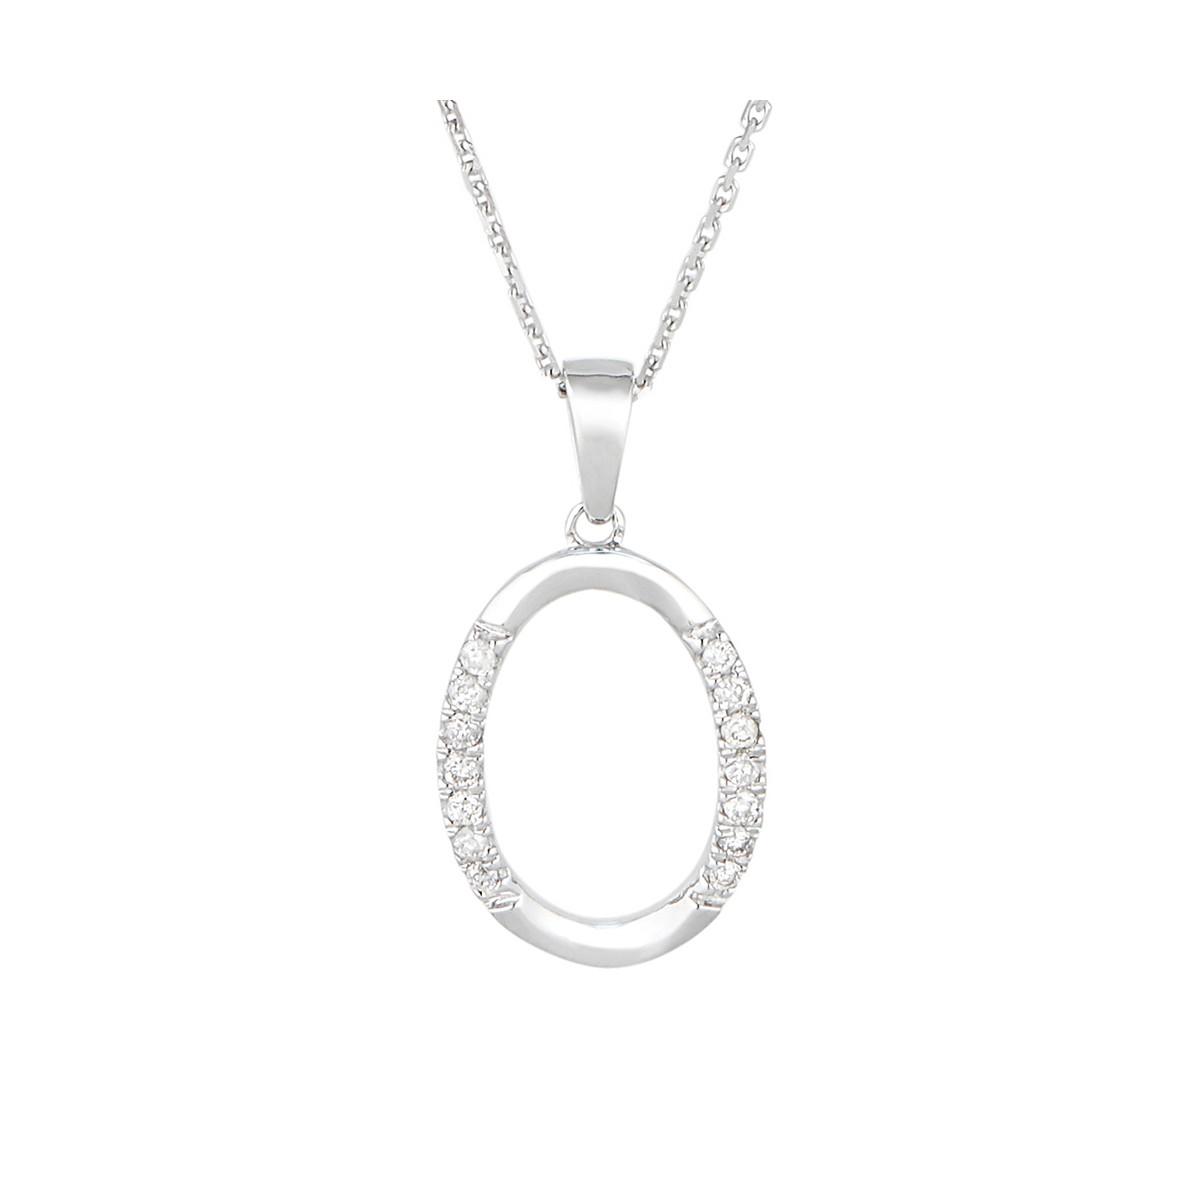 "Pendentif Or Blanc 375 ""MARIA"" Diamants 0.4 carats"